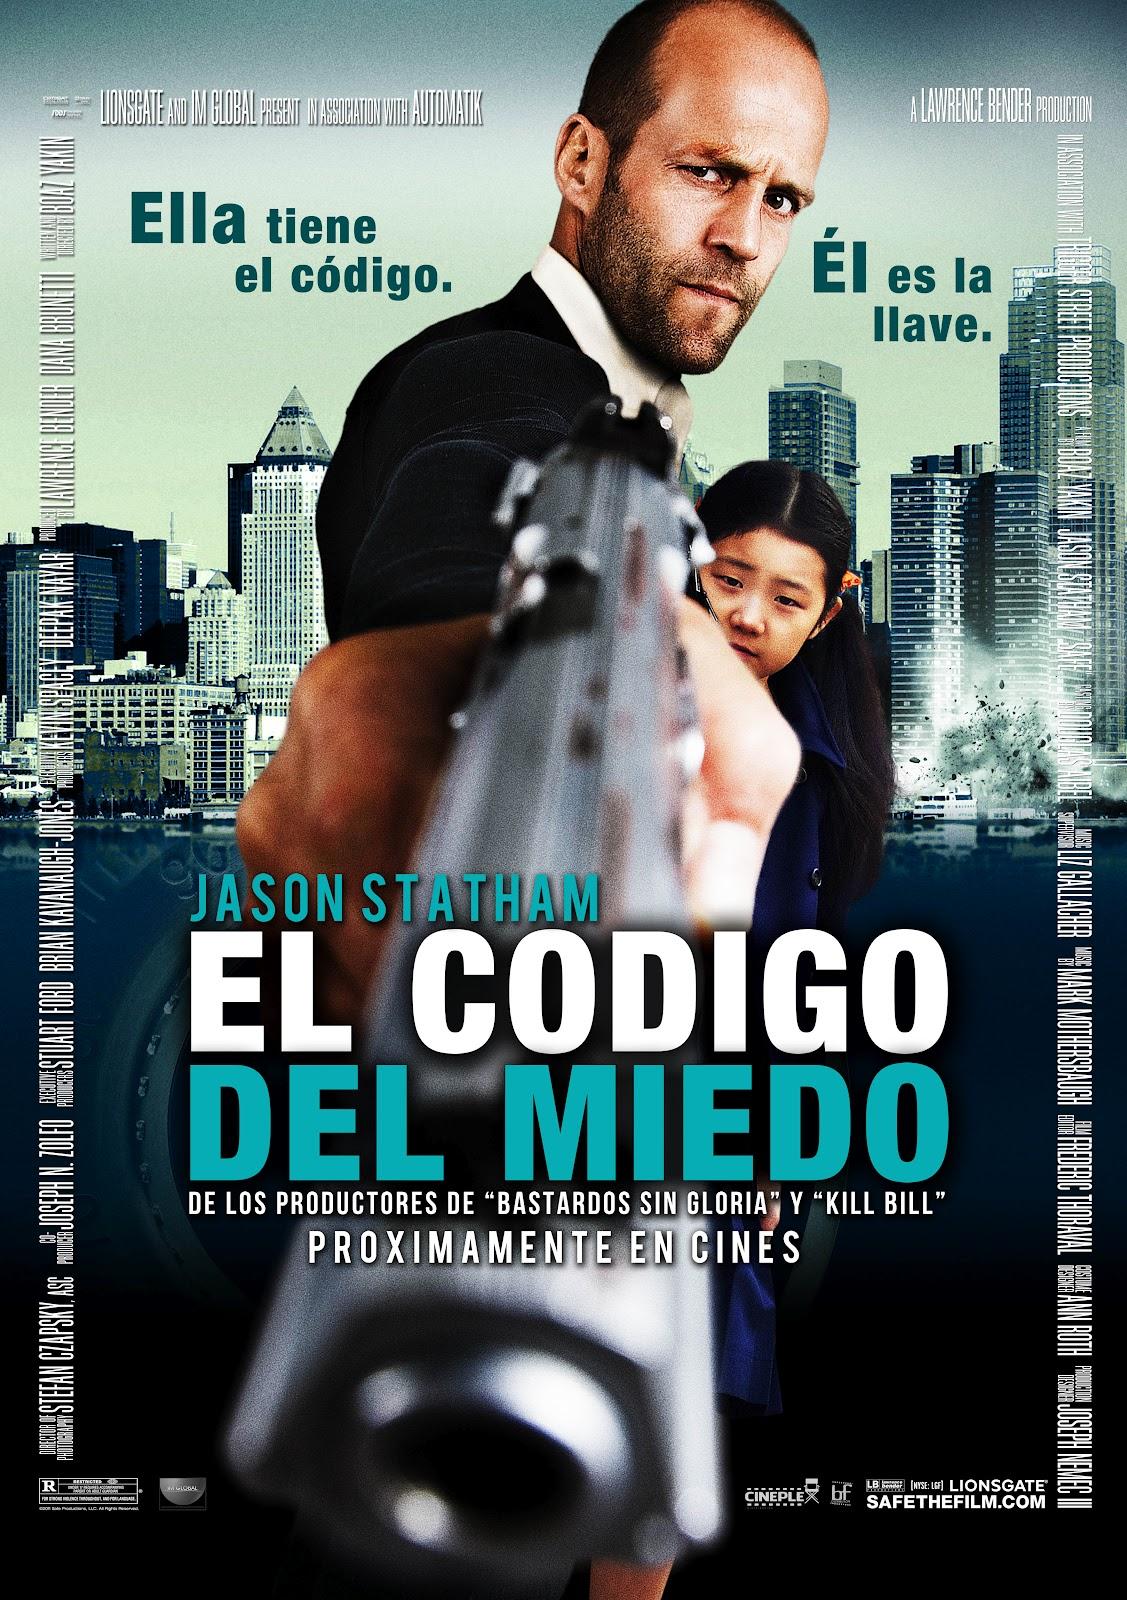 http://3.bp.blogspot.com/-6a4RoxLYDBo/UEO015w-L5I/AAAAAAAAAbA/SGHTqWDnKP8/s1600/El+Codigo+Del+Miedo+Por+Peppito+-+carteles.jpg